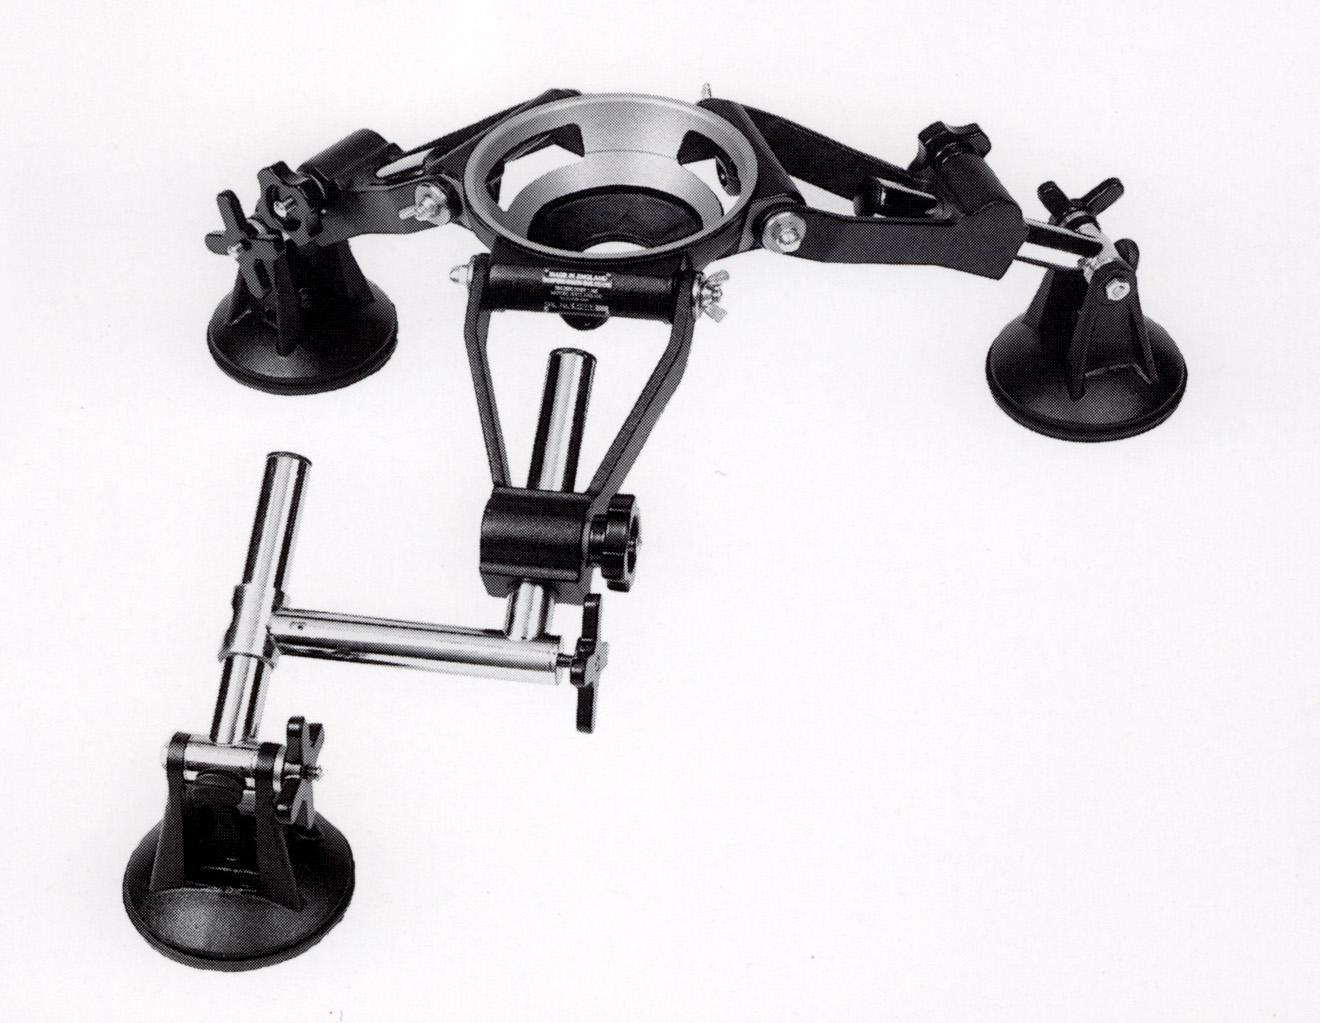 Ronford Baker - Low Angle Car Grip Kit Image